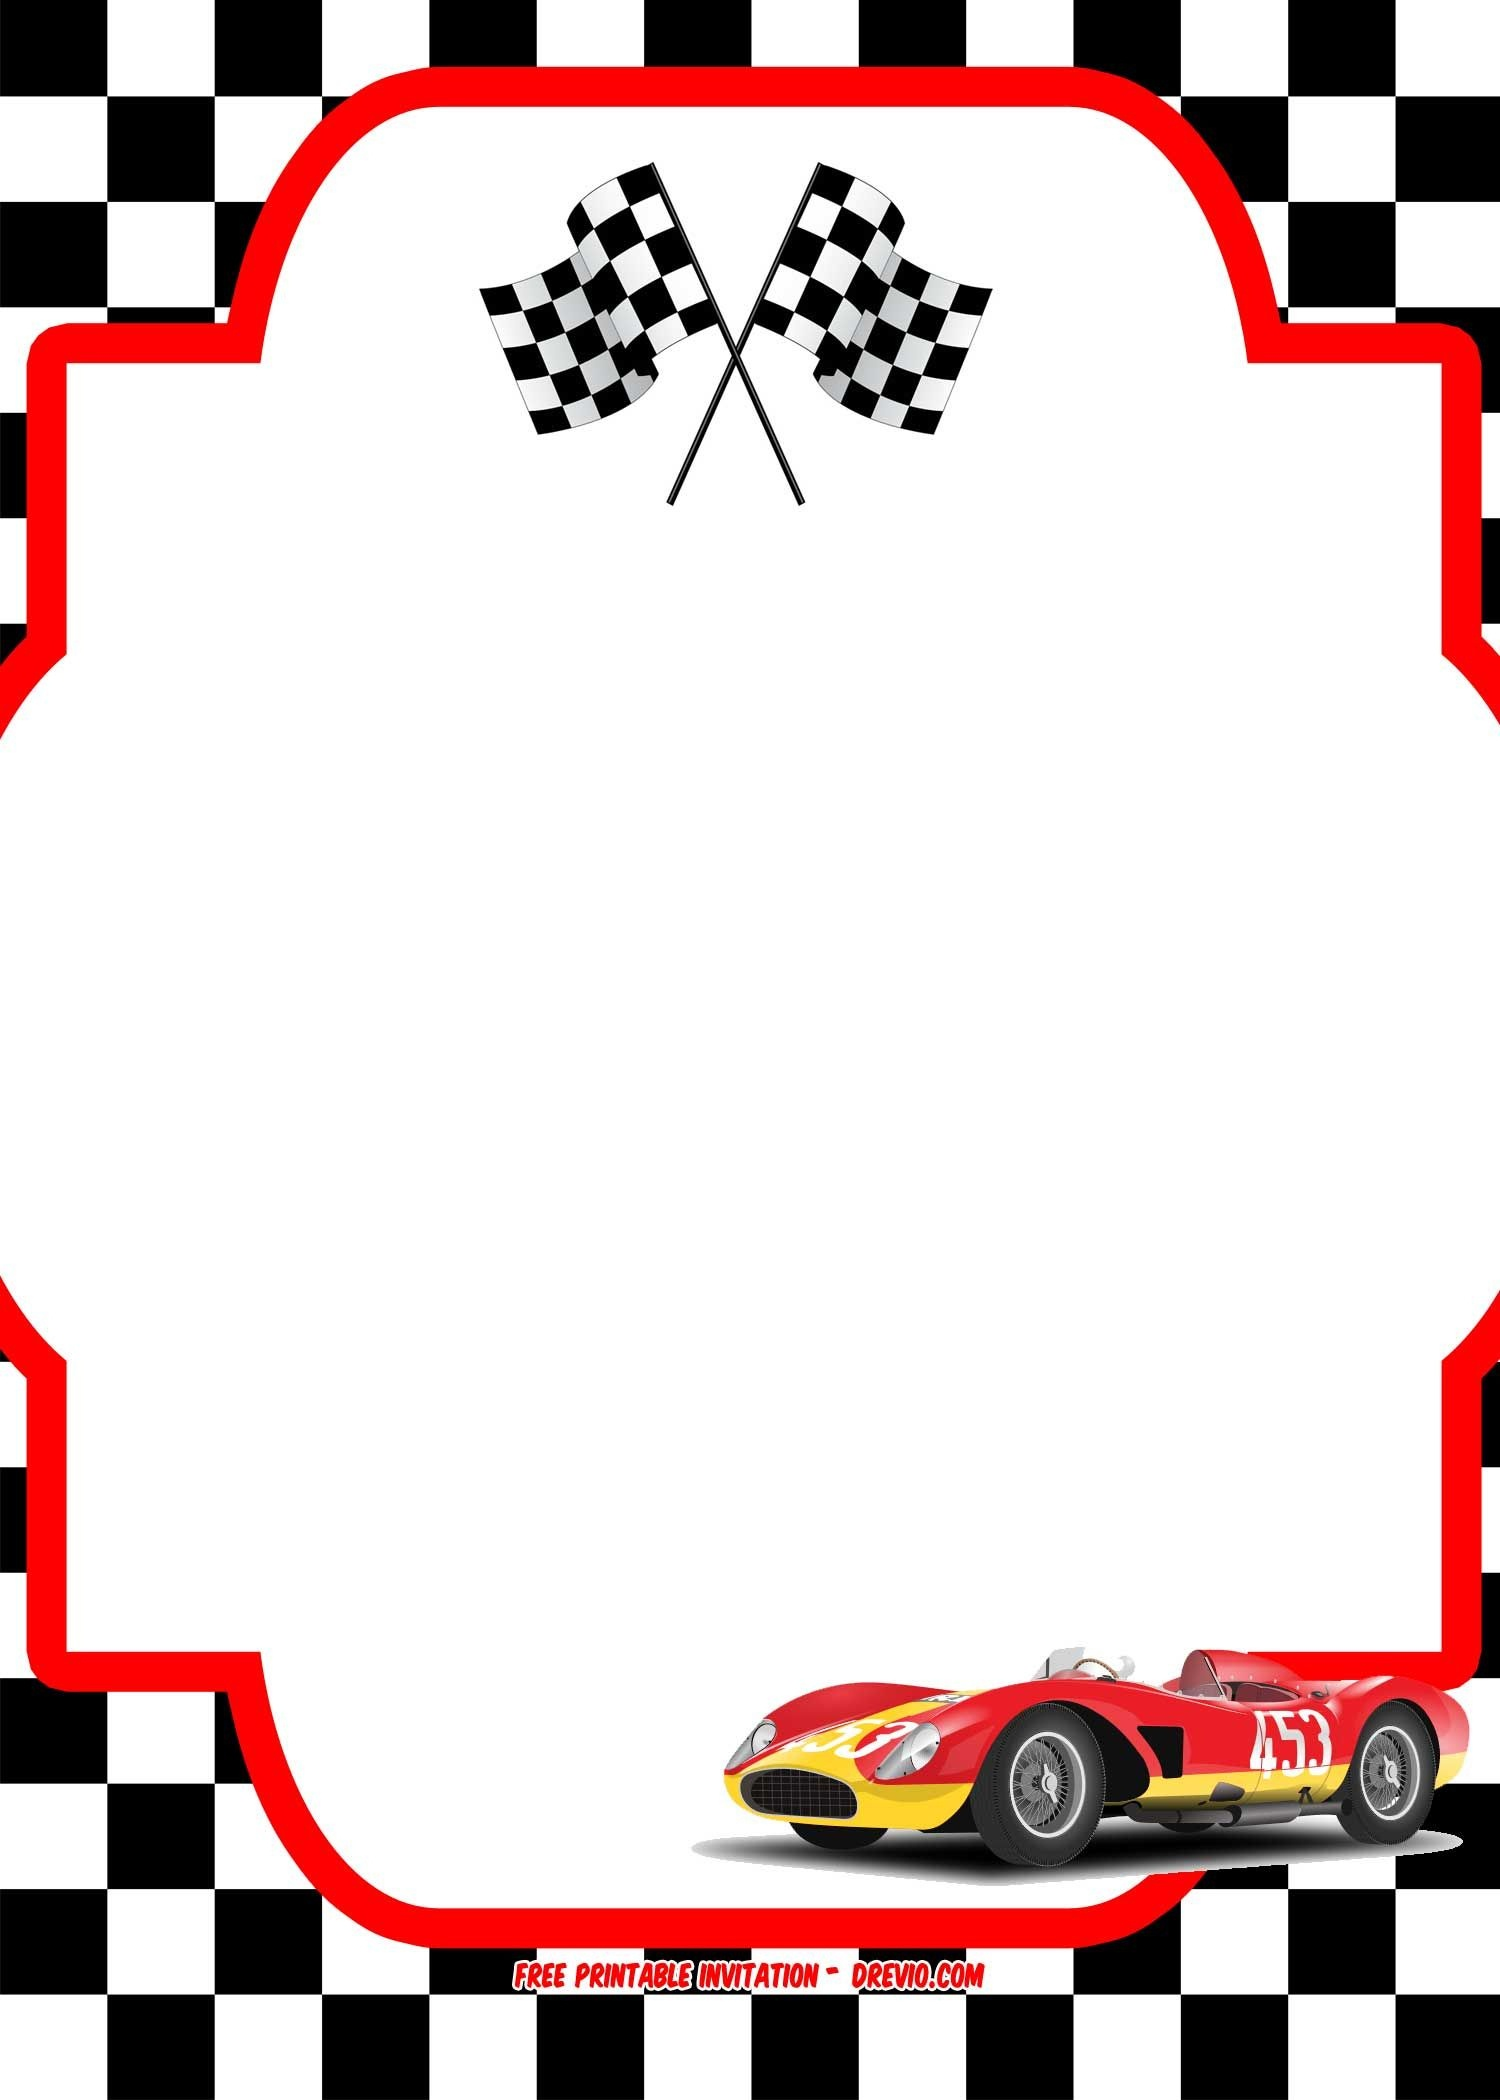 Free Race Car Birthday Invitation Template - Printable | Kids Party - Free Printable Birthday Invitations Cars Theme